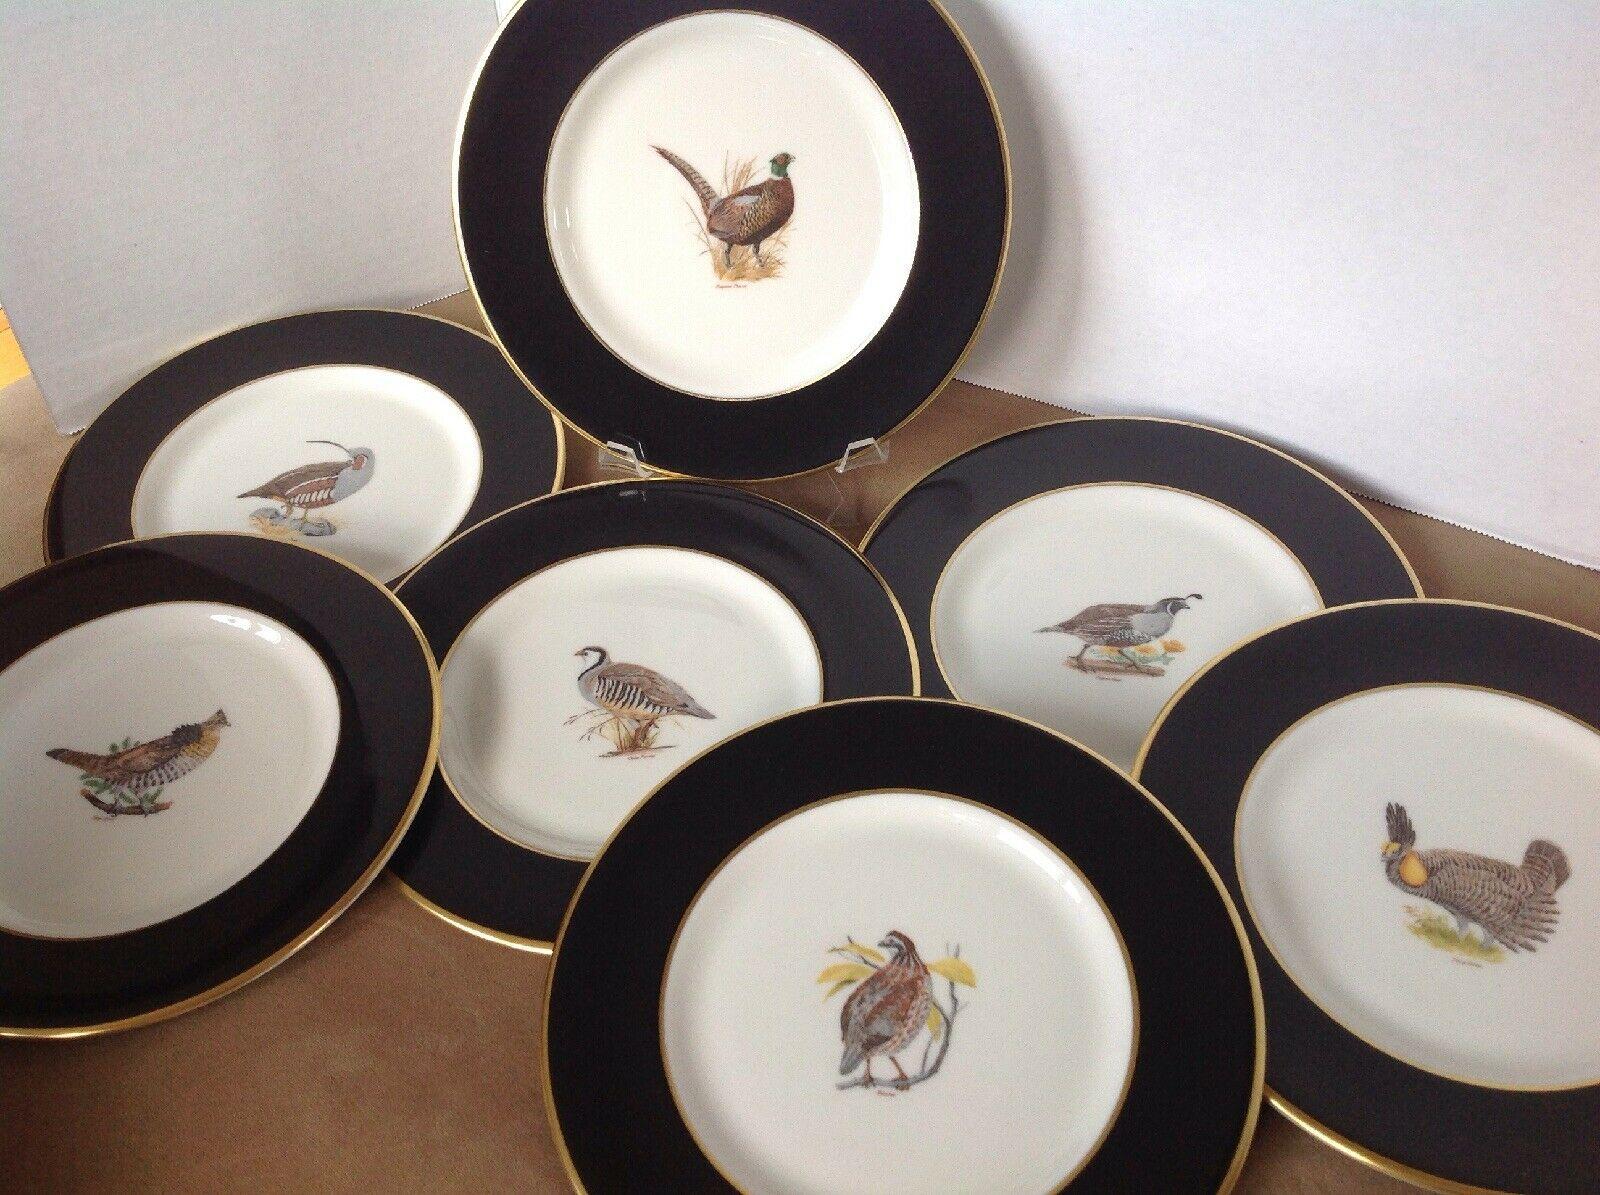 Orvis Game Bird Plates